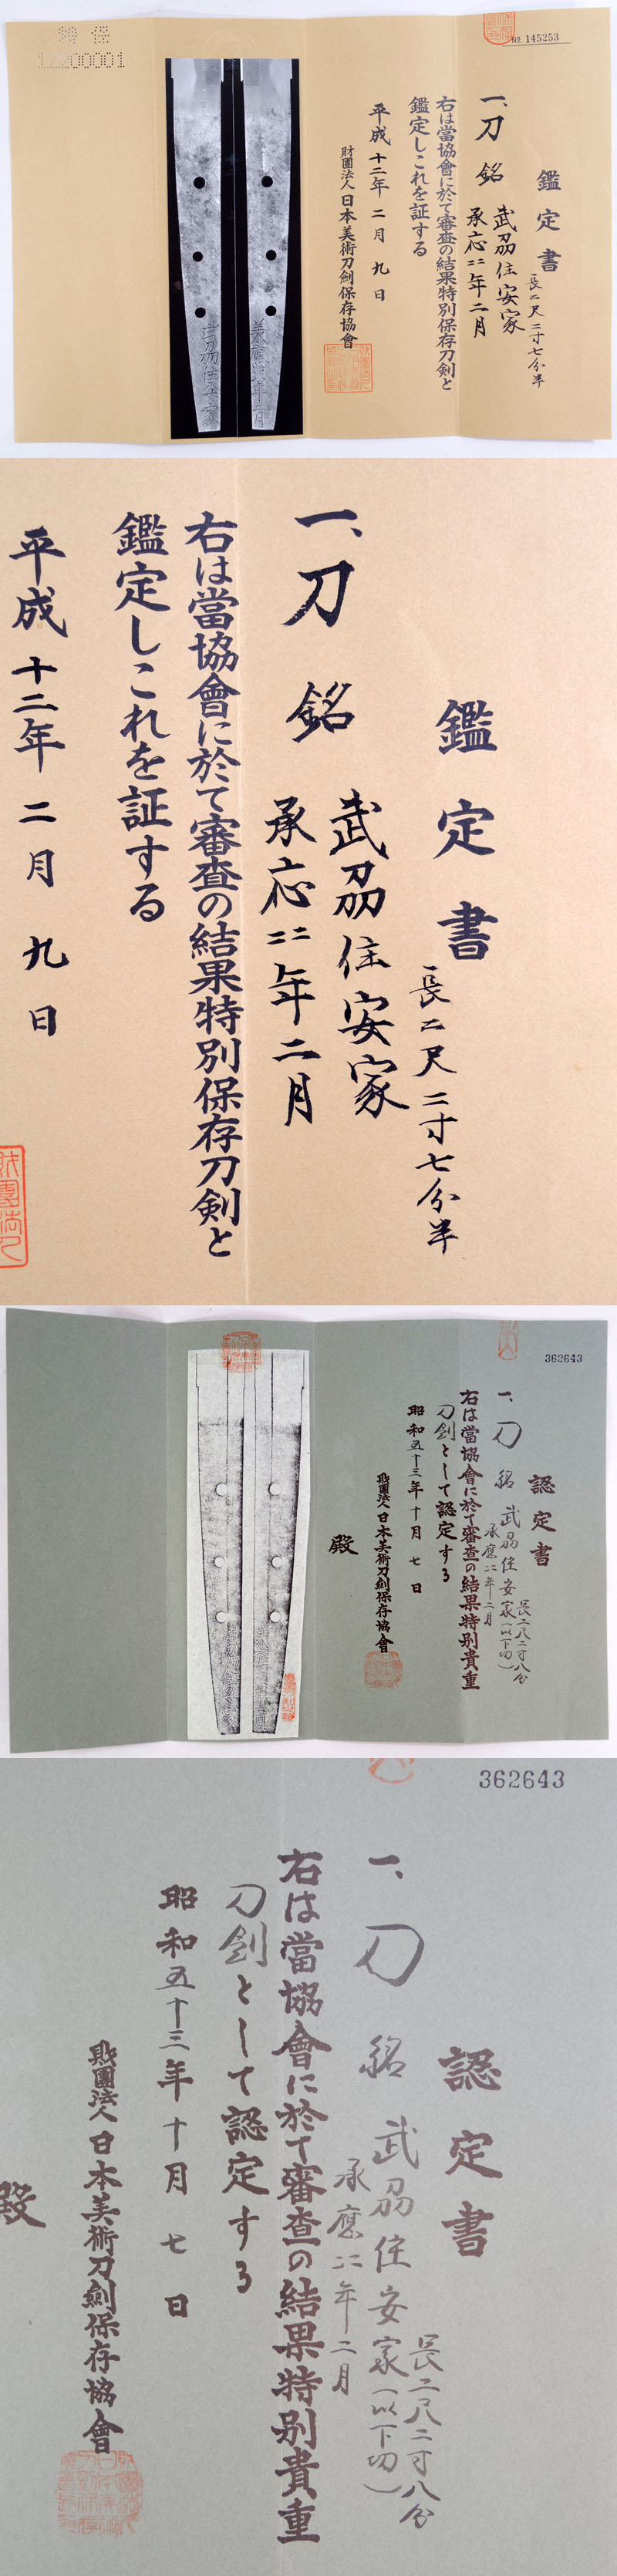 武刕住安家(大和守安定の門人) Picture of Certificate